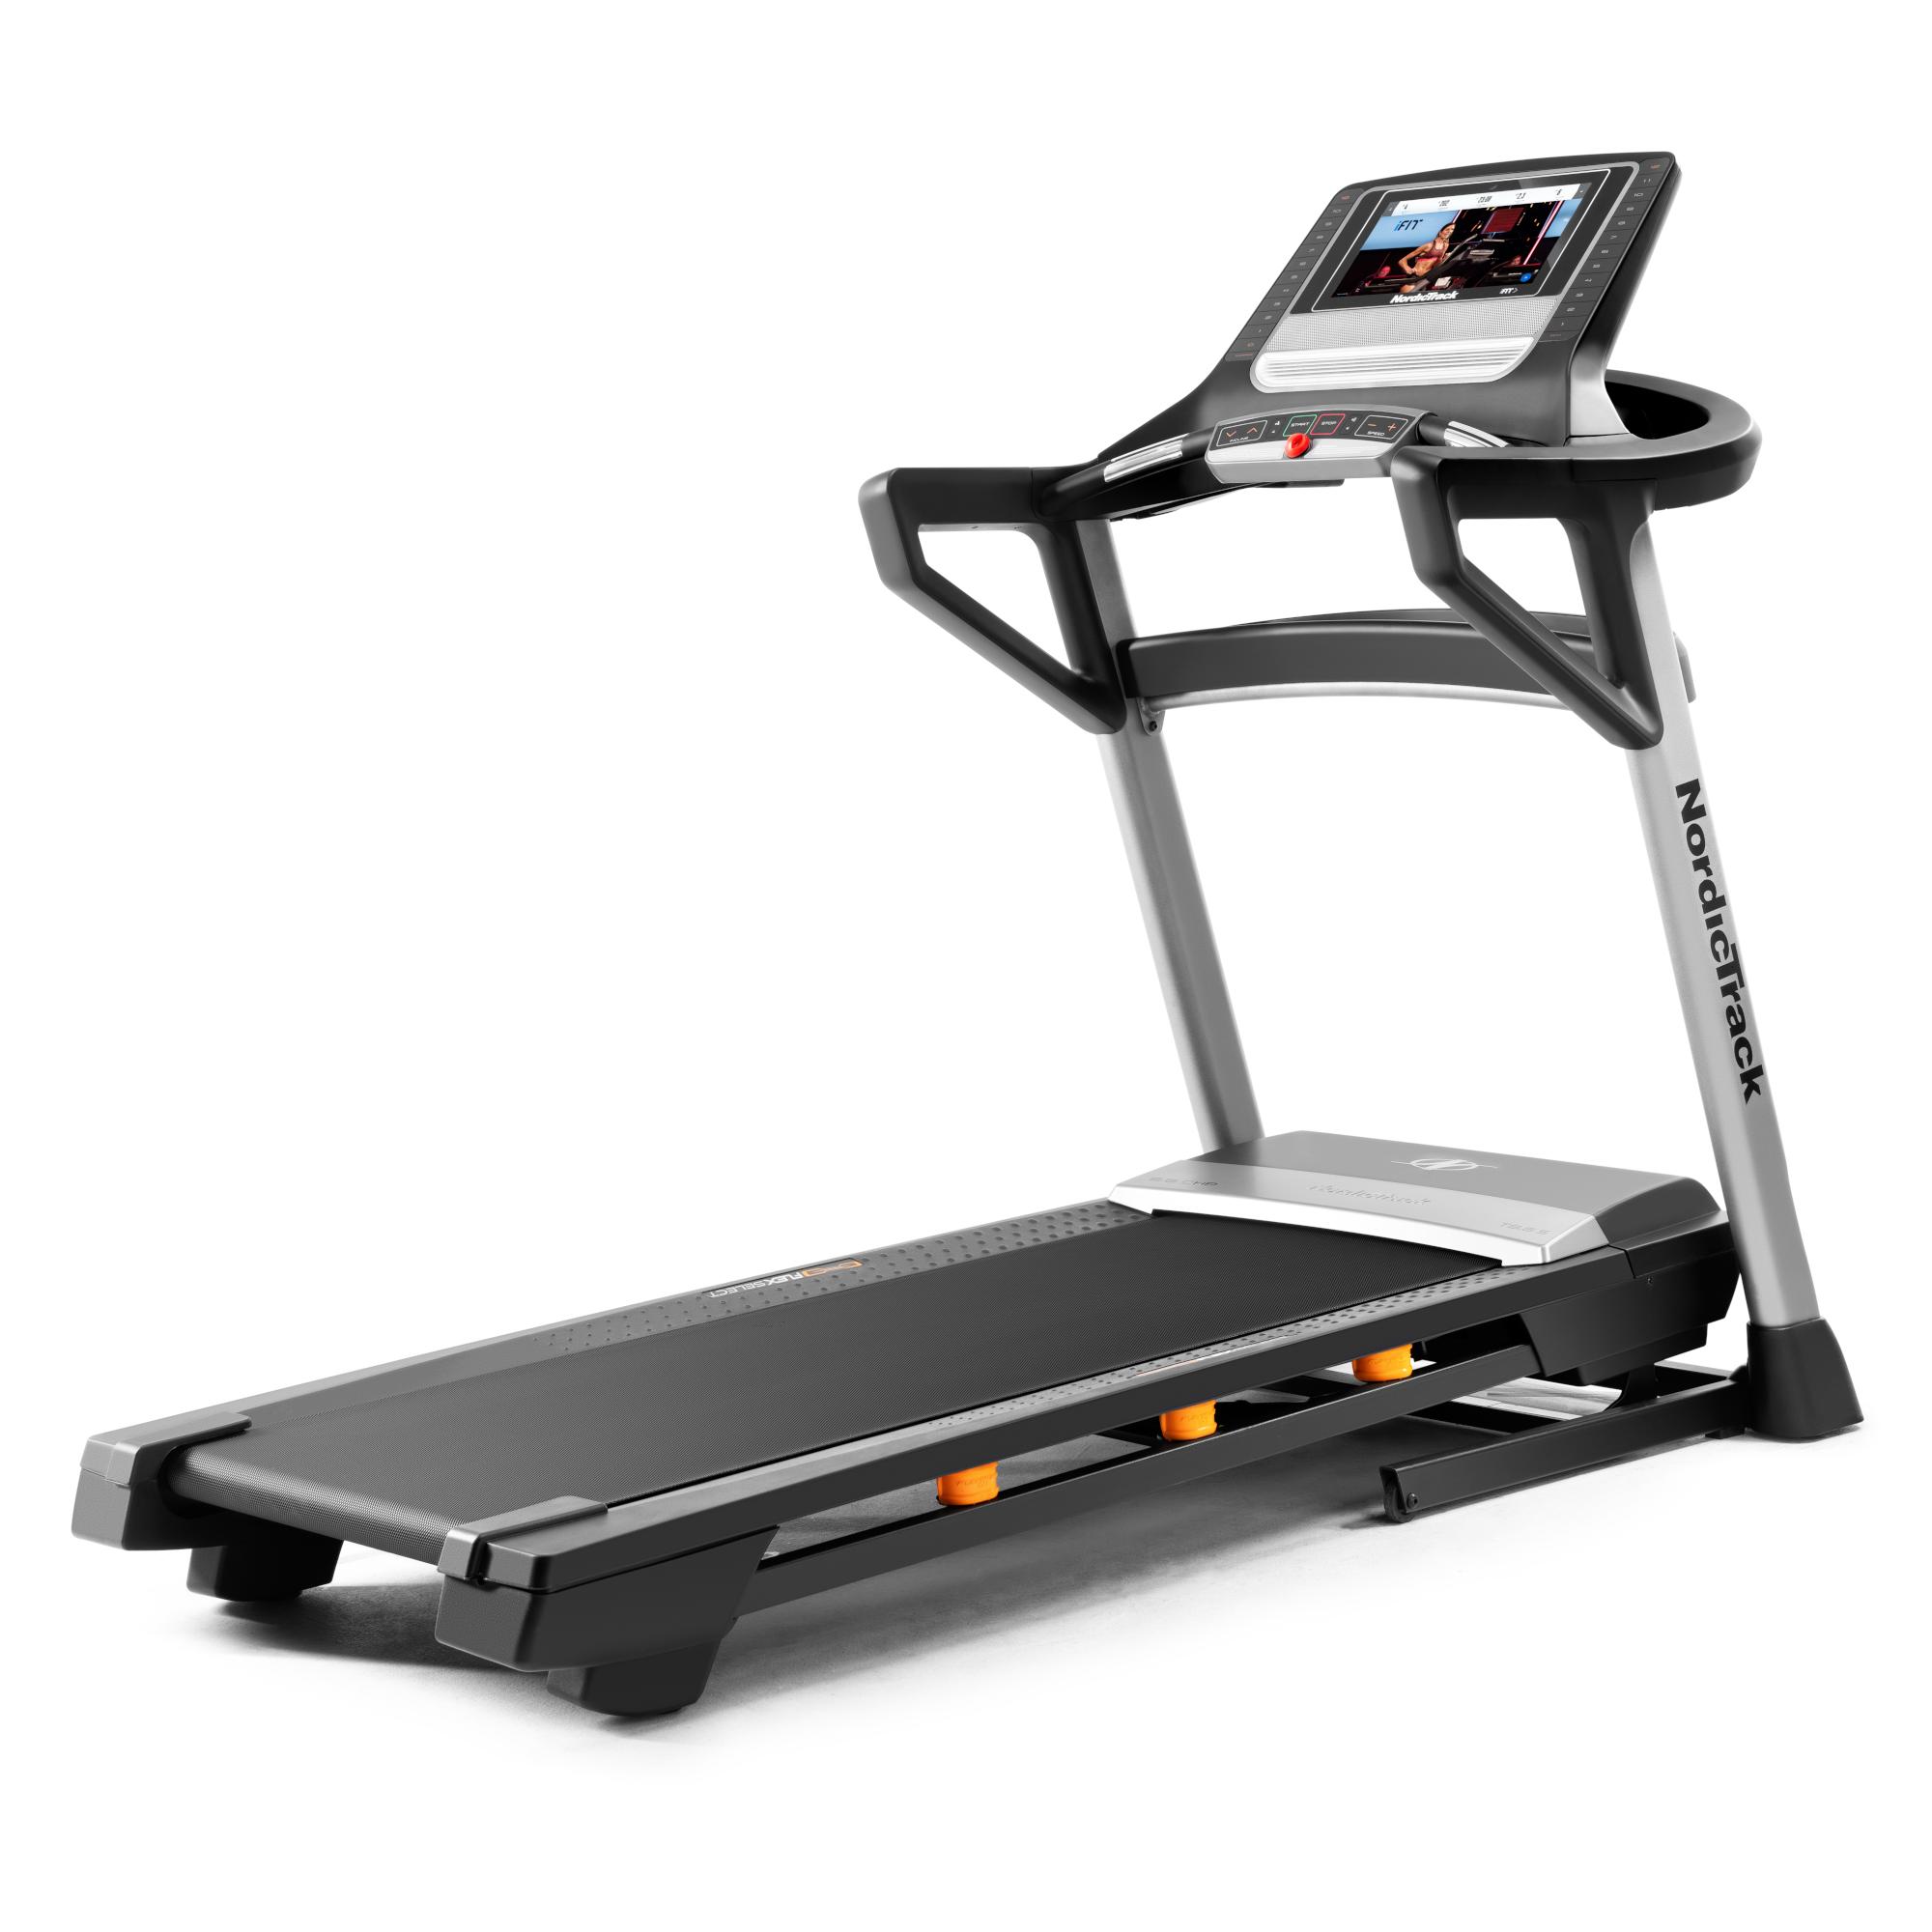 NordicTrack T9.5S Treadmill